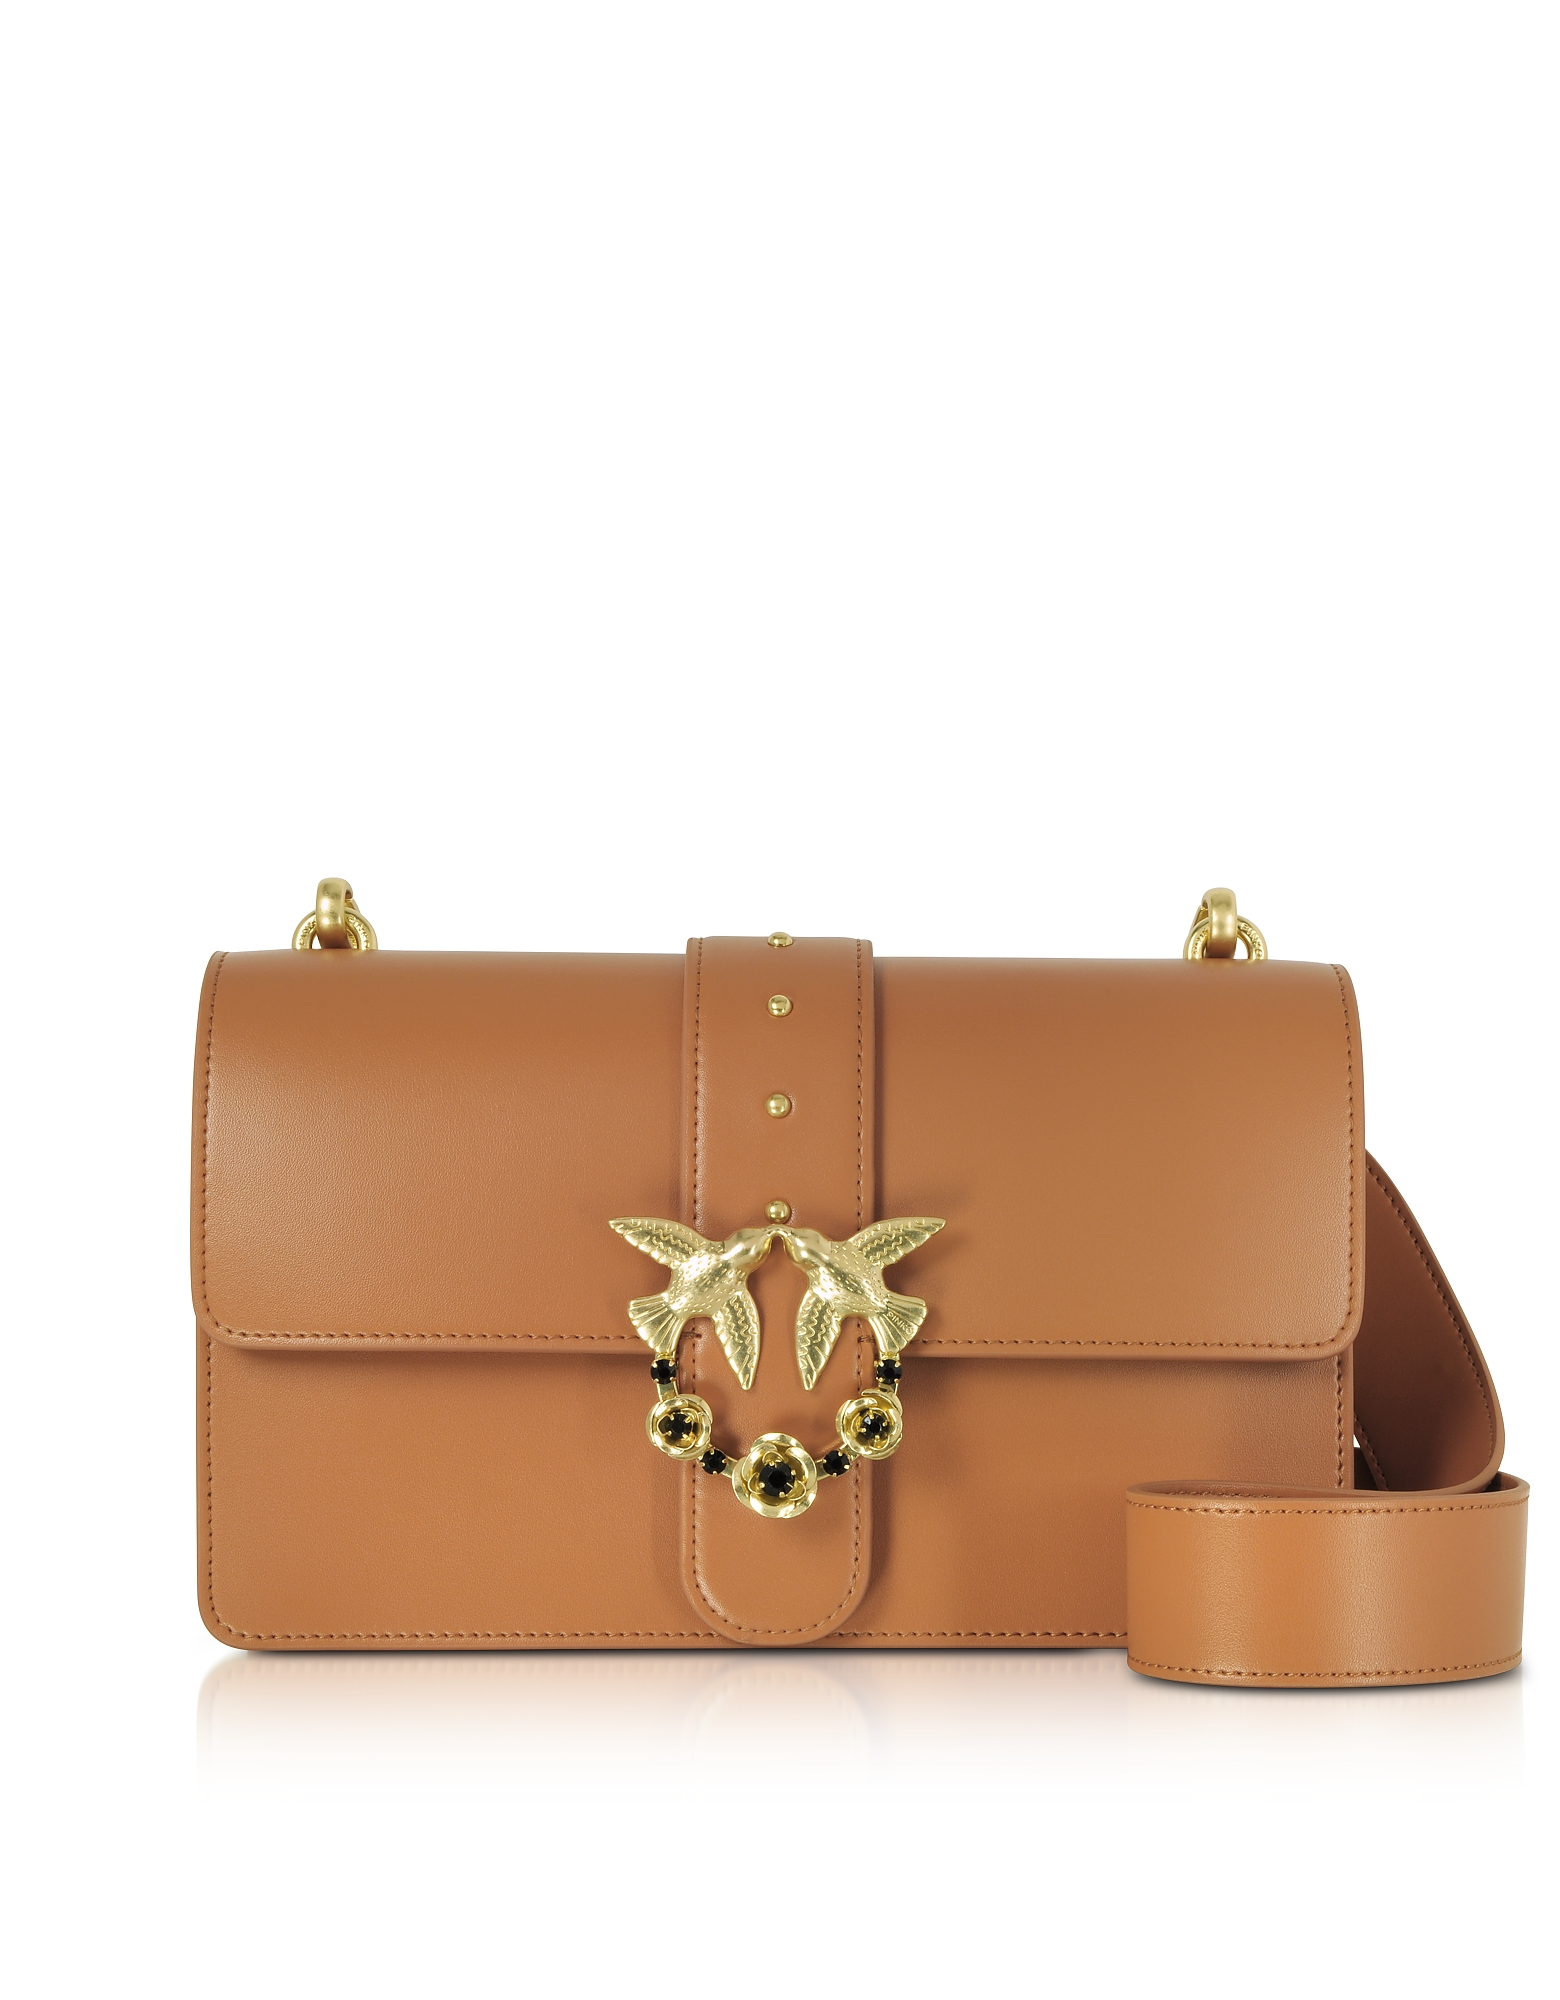 Pinko Handbags, Love Abbraccio Leather Shoulder Bag